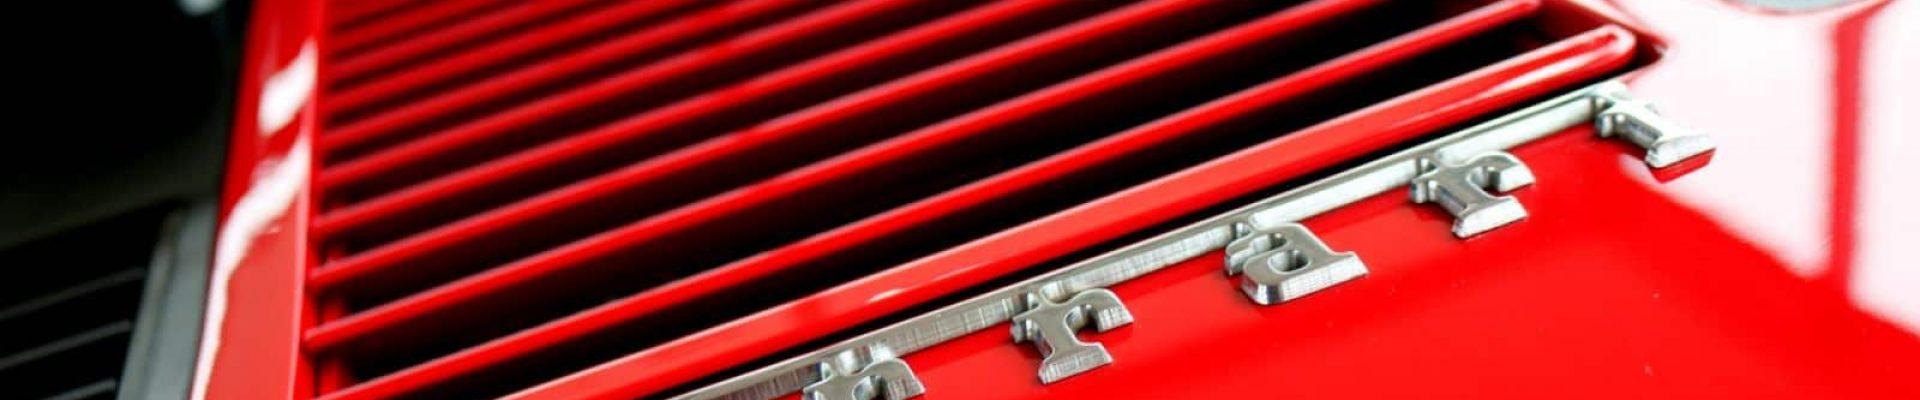 Ferrari Car Battery banner